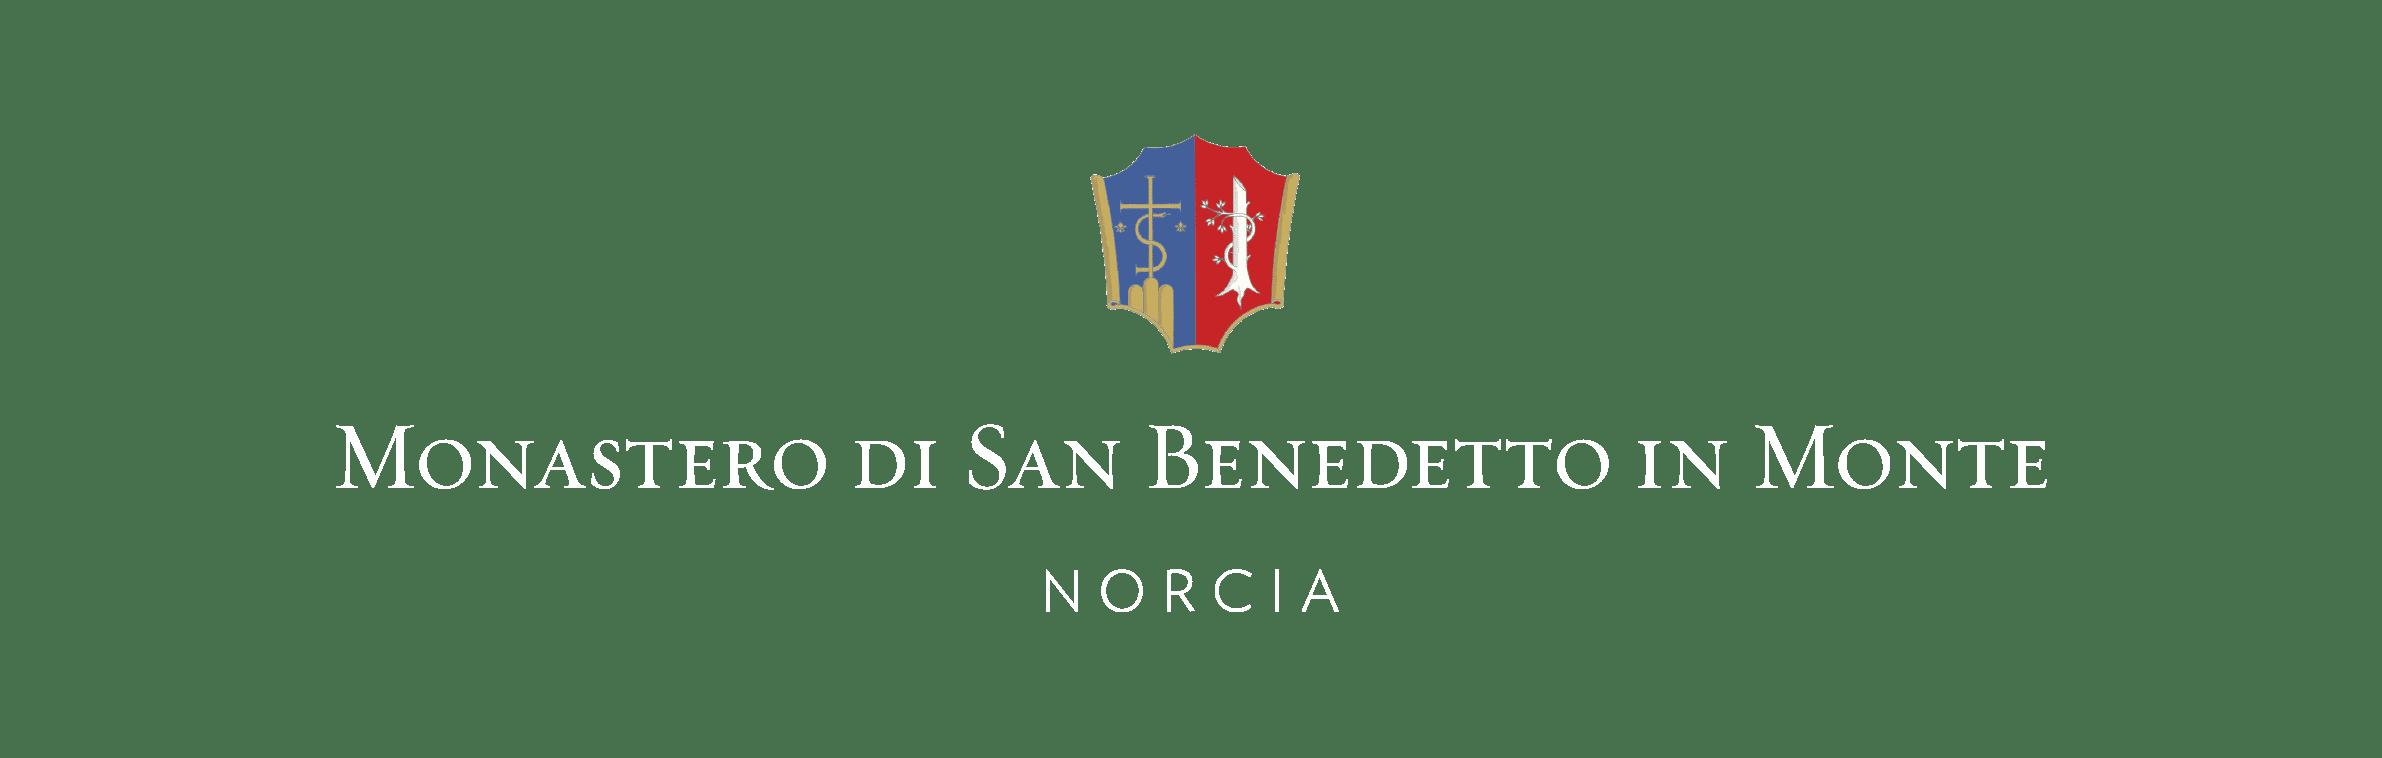 Norcia logo